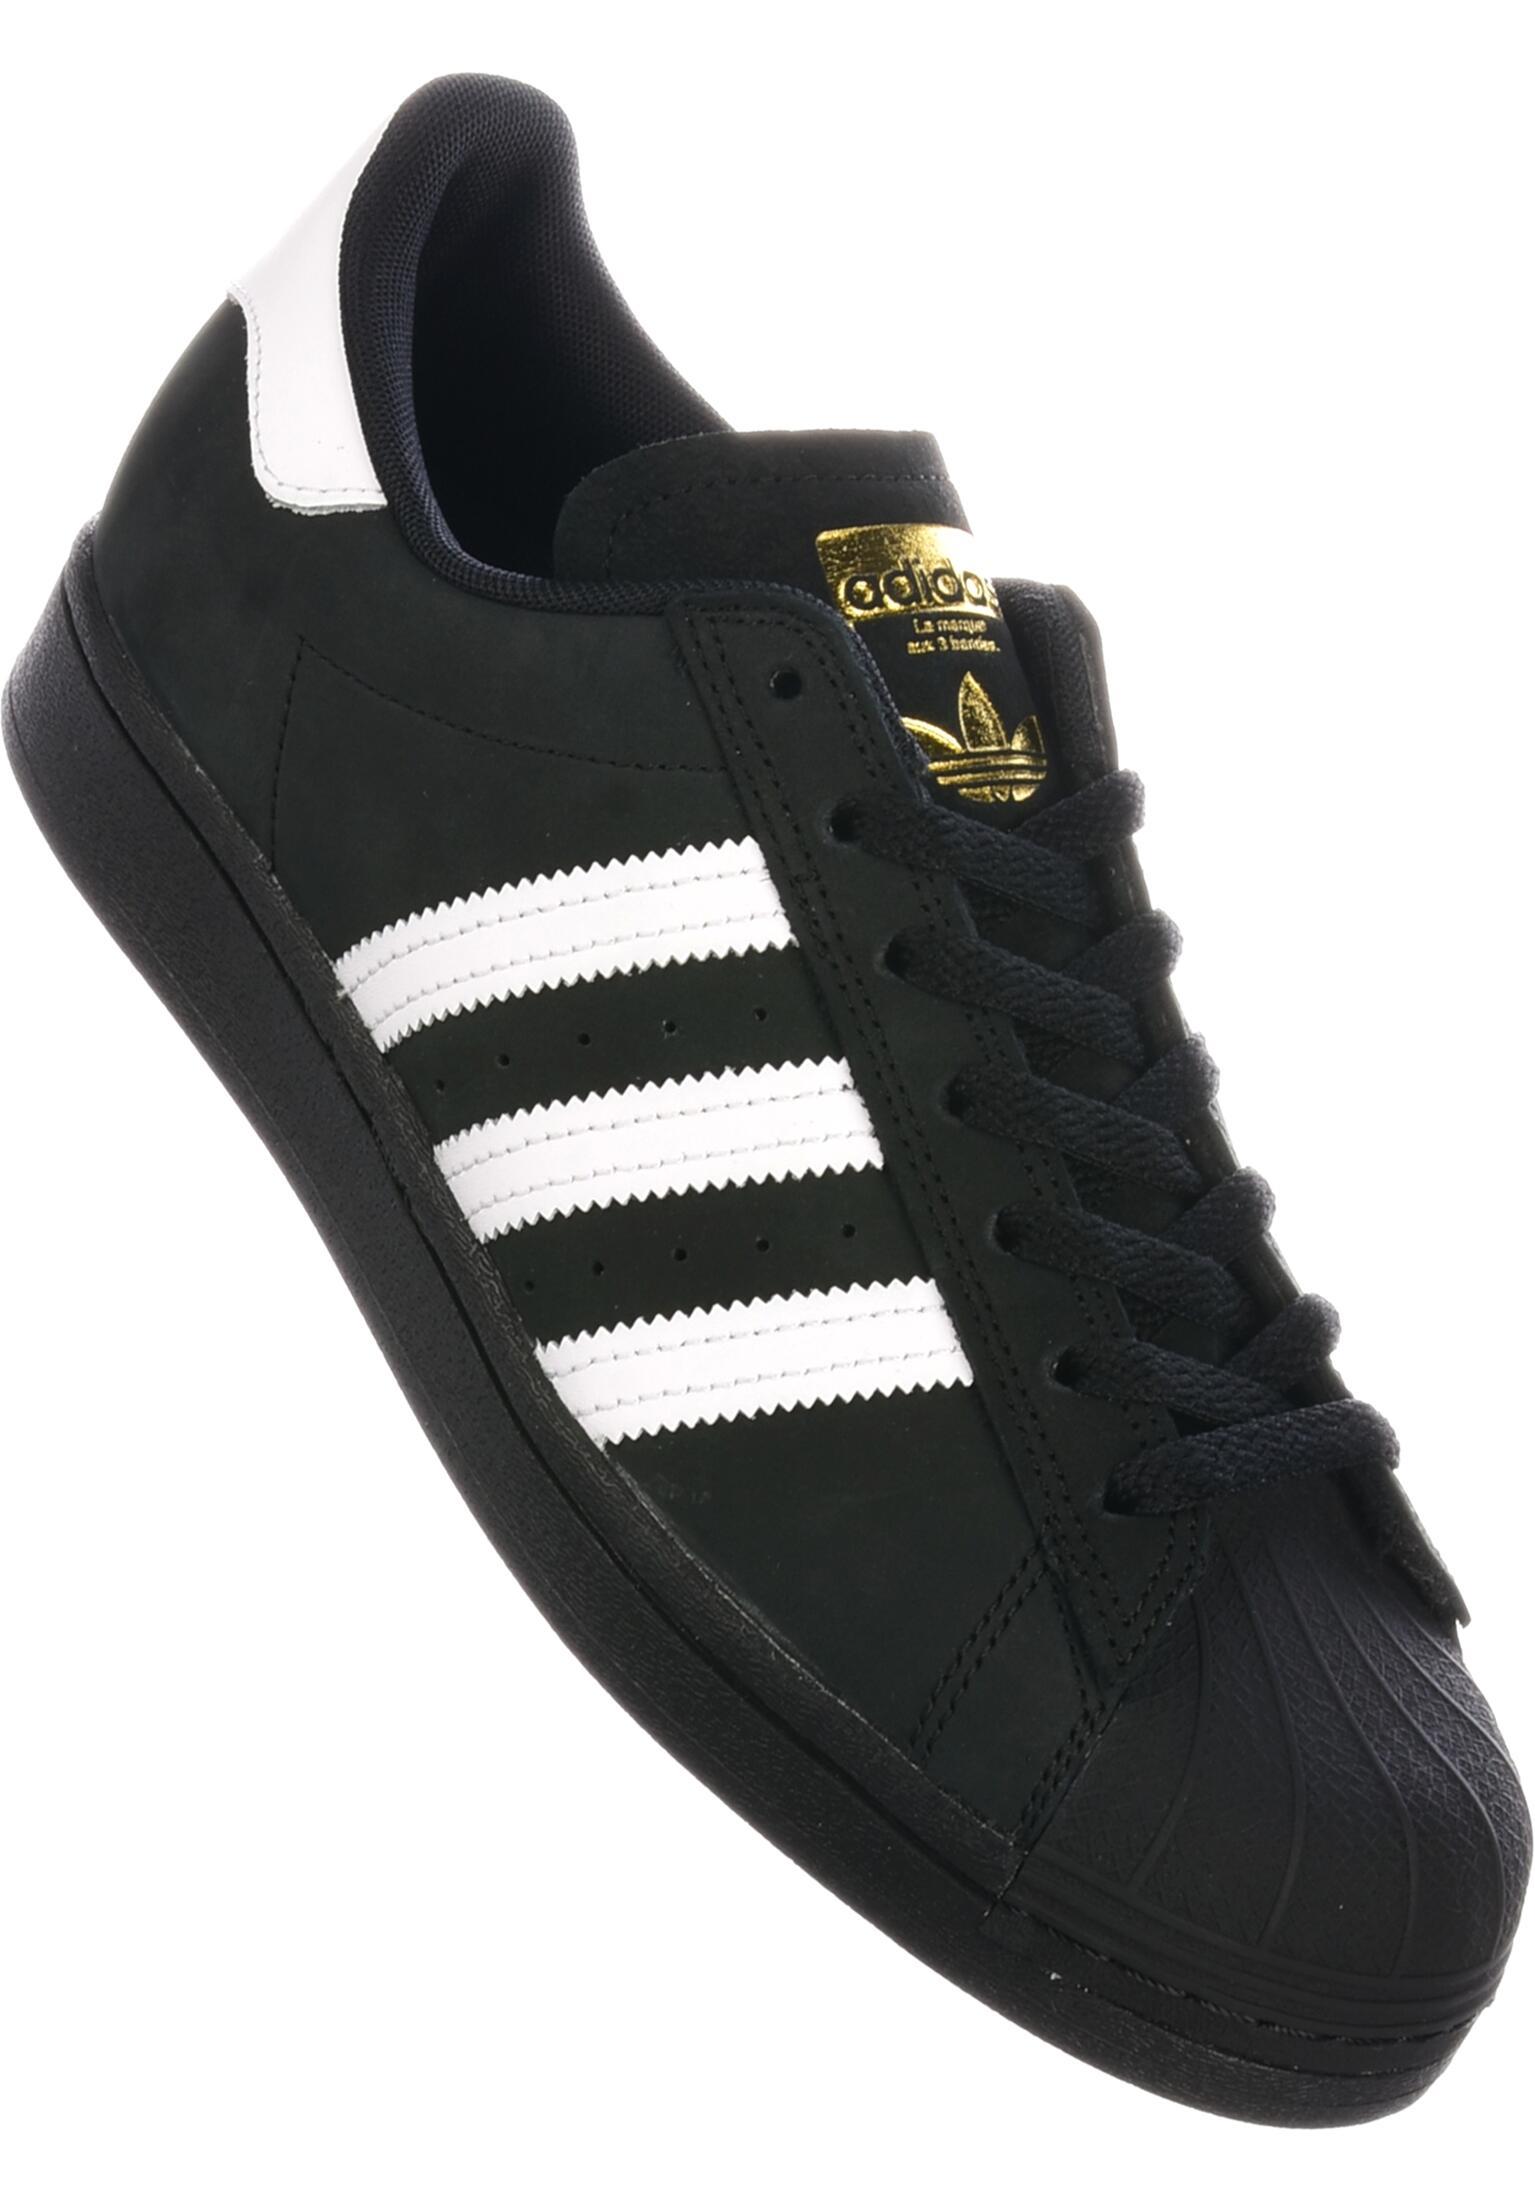 44 44 Adidas SUPERSTAR Gold, Men's Skateboarding Shoes